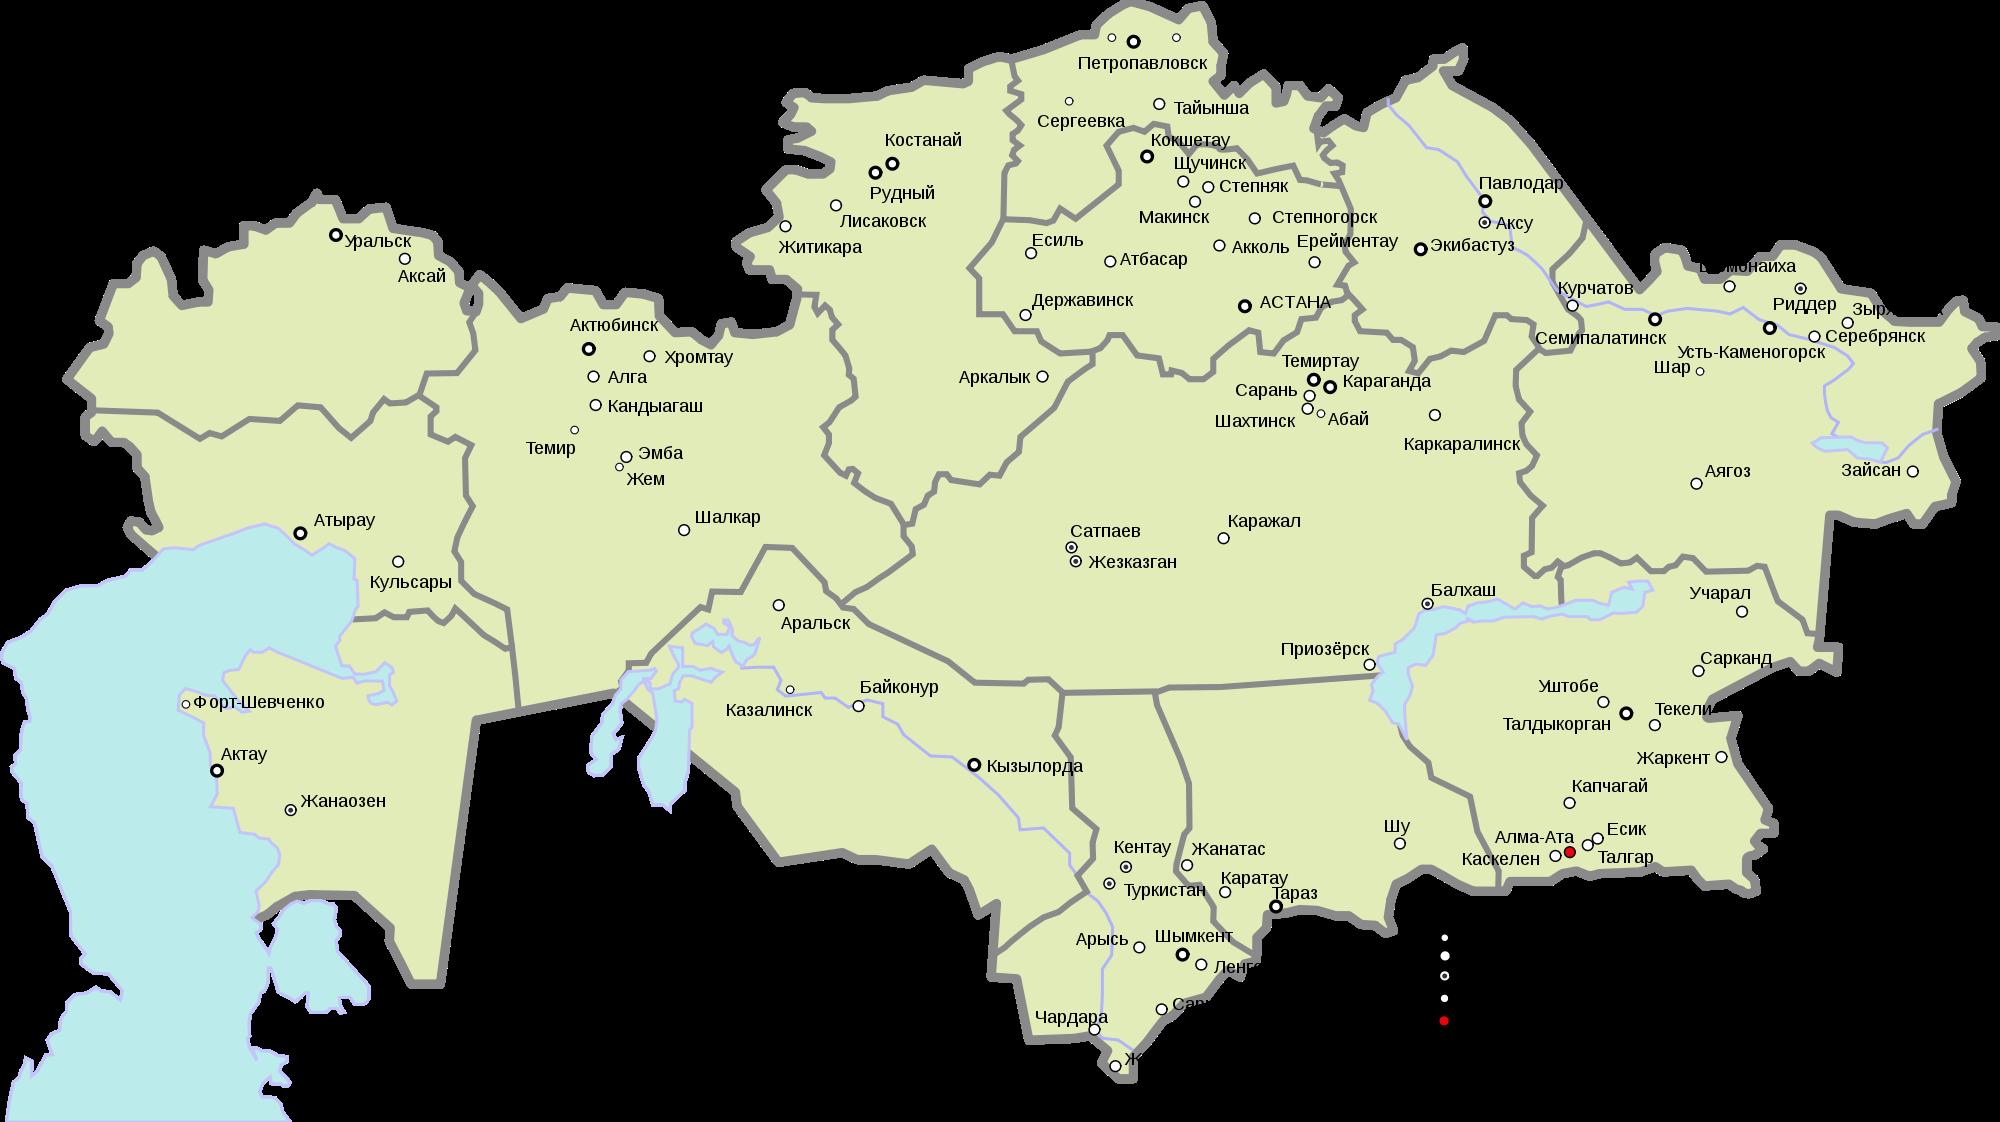 karte kasachstan Landkarte Kasachstan (Karte in lokaler Sprache) : Weltkarte. karte kasachstan